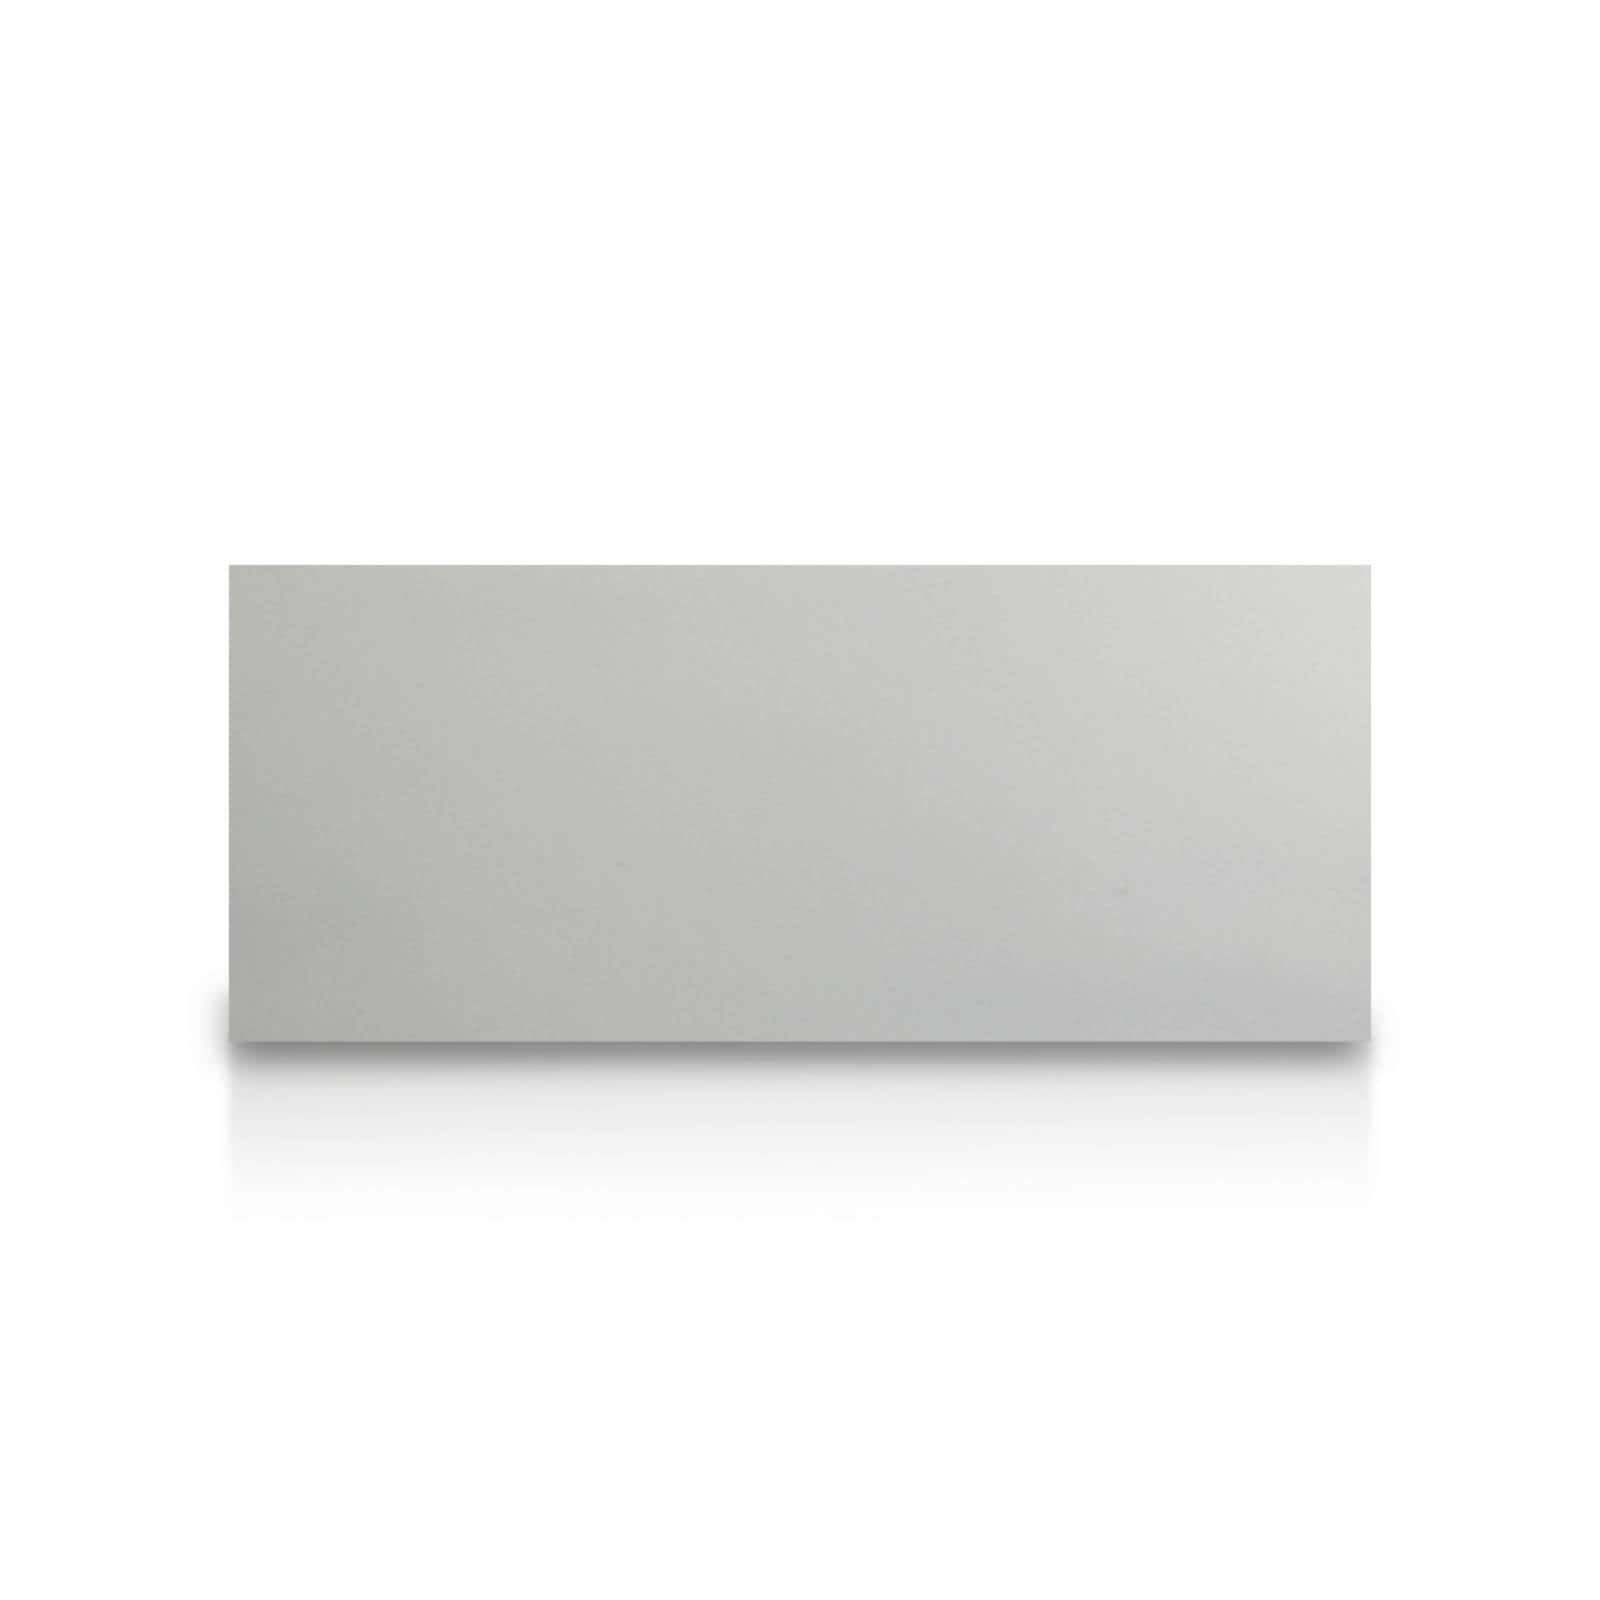 Aislante Cerámico Protector Térmico para Techo de 60 x 25 cm Blanco, Mod: 1PTTBl